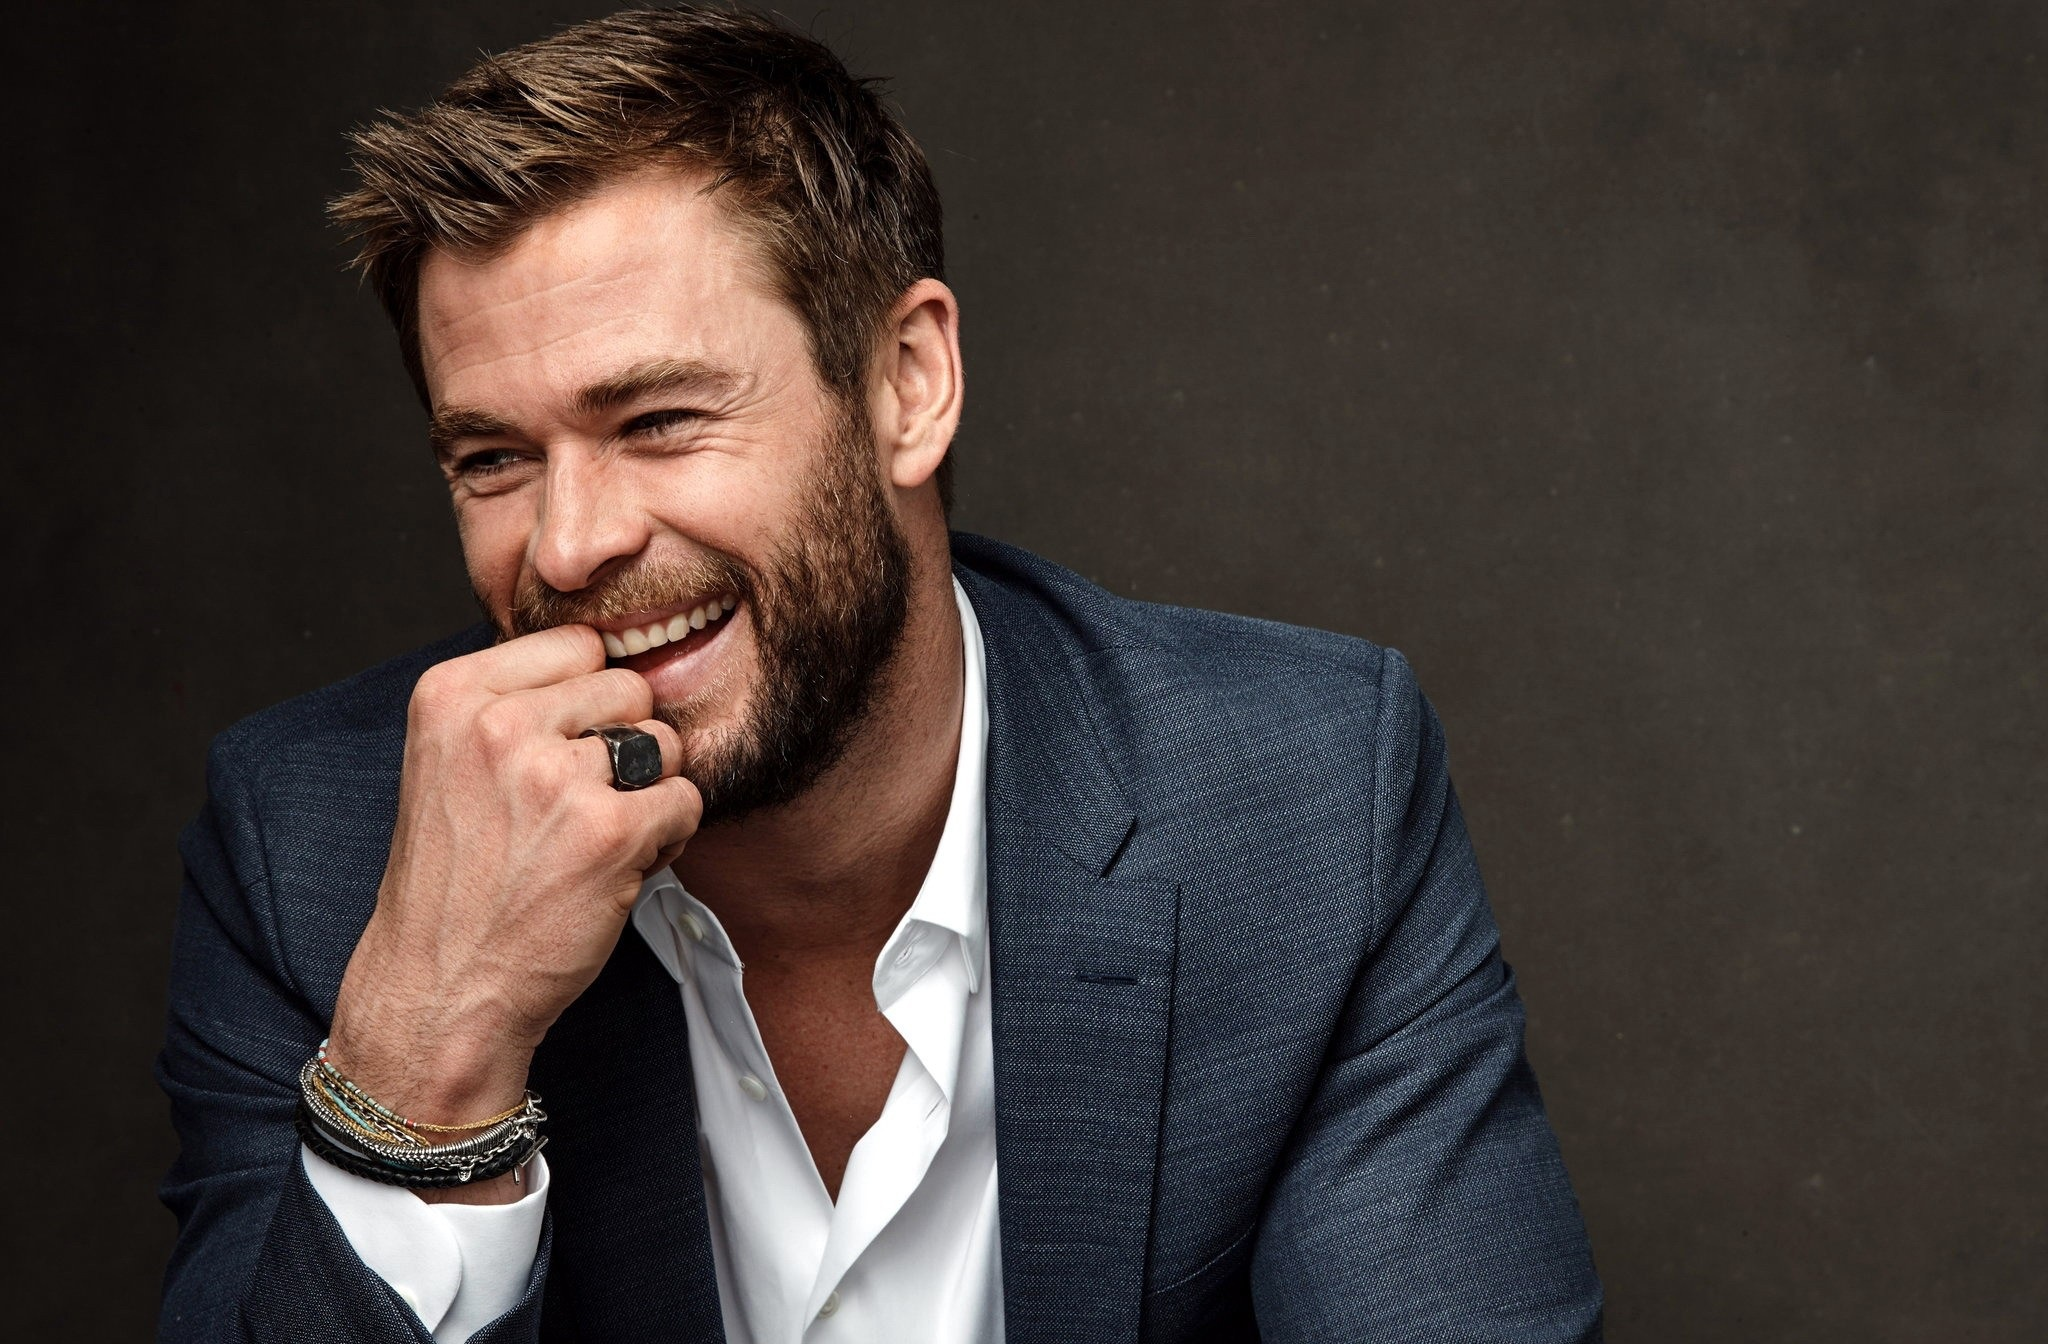 Wallpaper of Actor Australian Beard Chris Hemsworth Smile 2048x1344